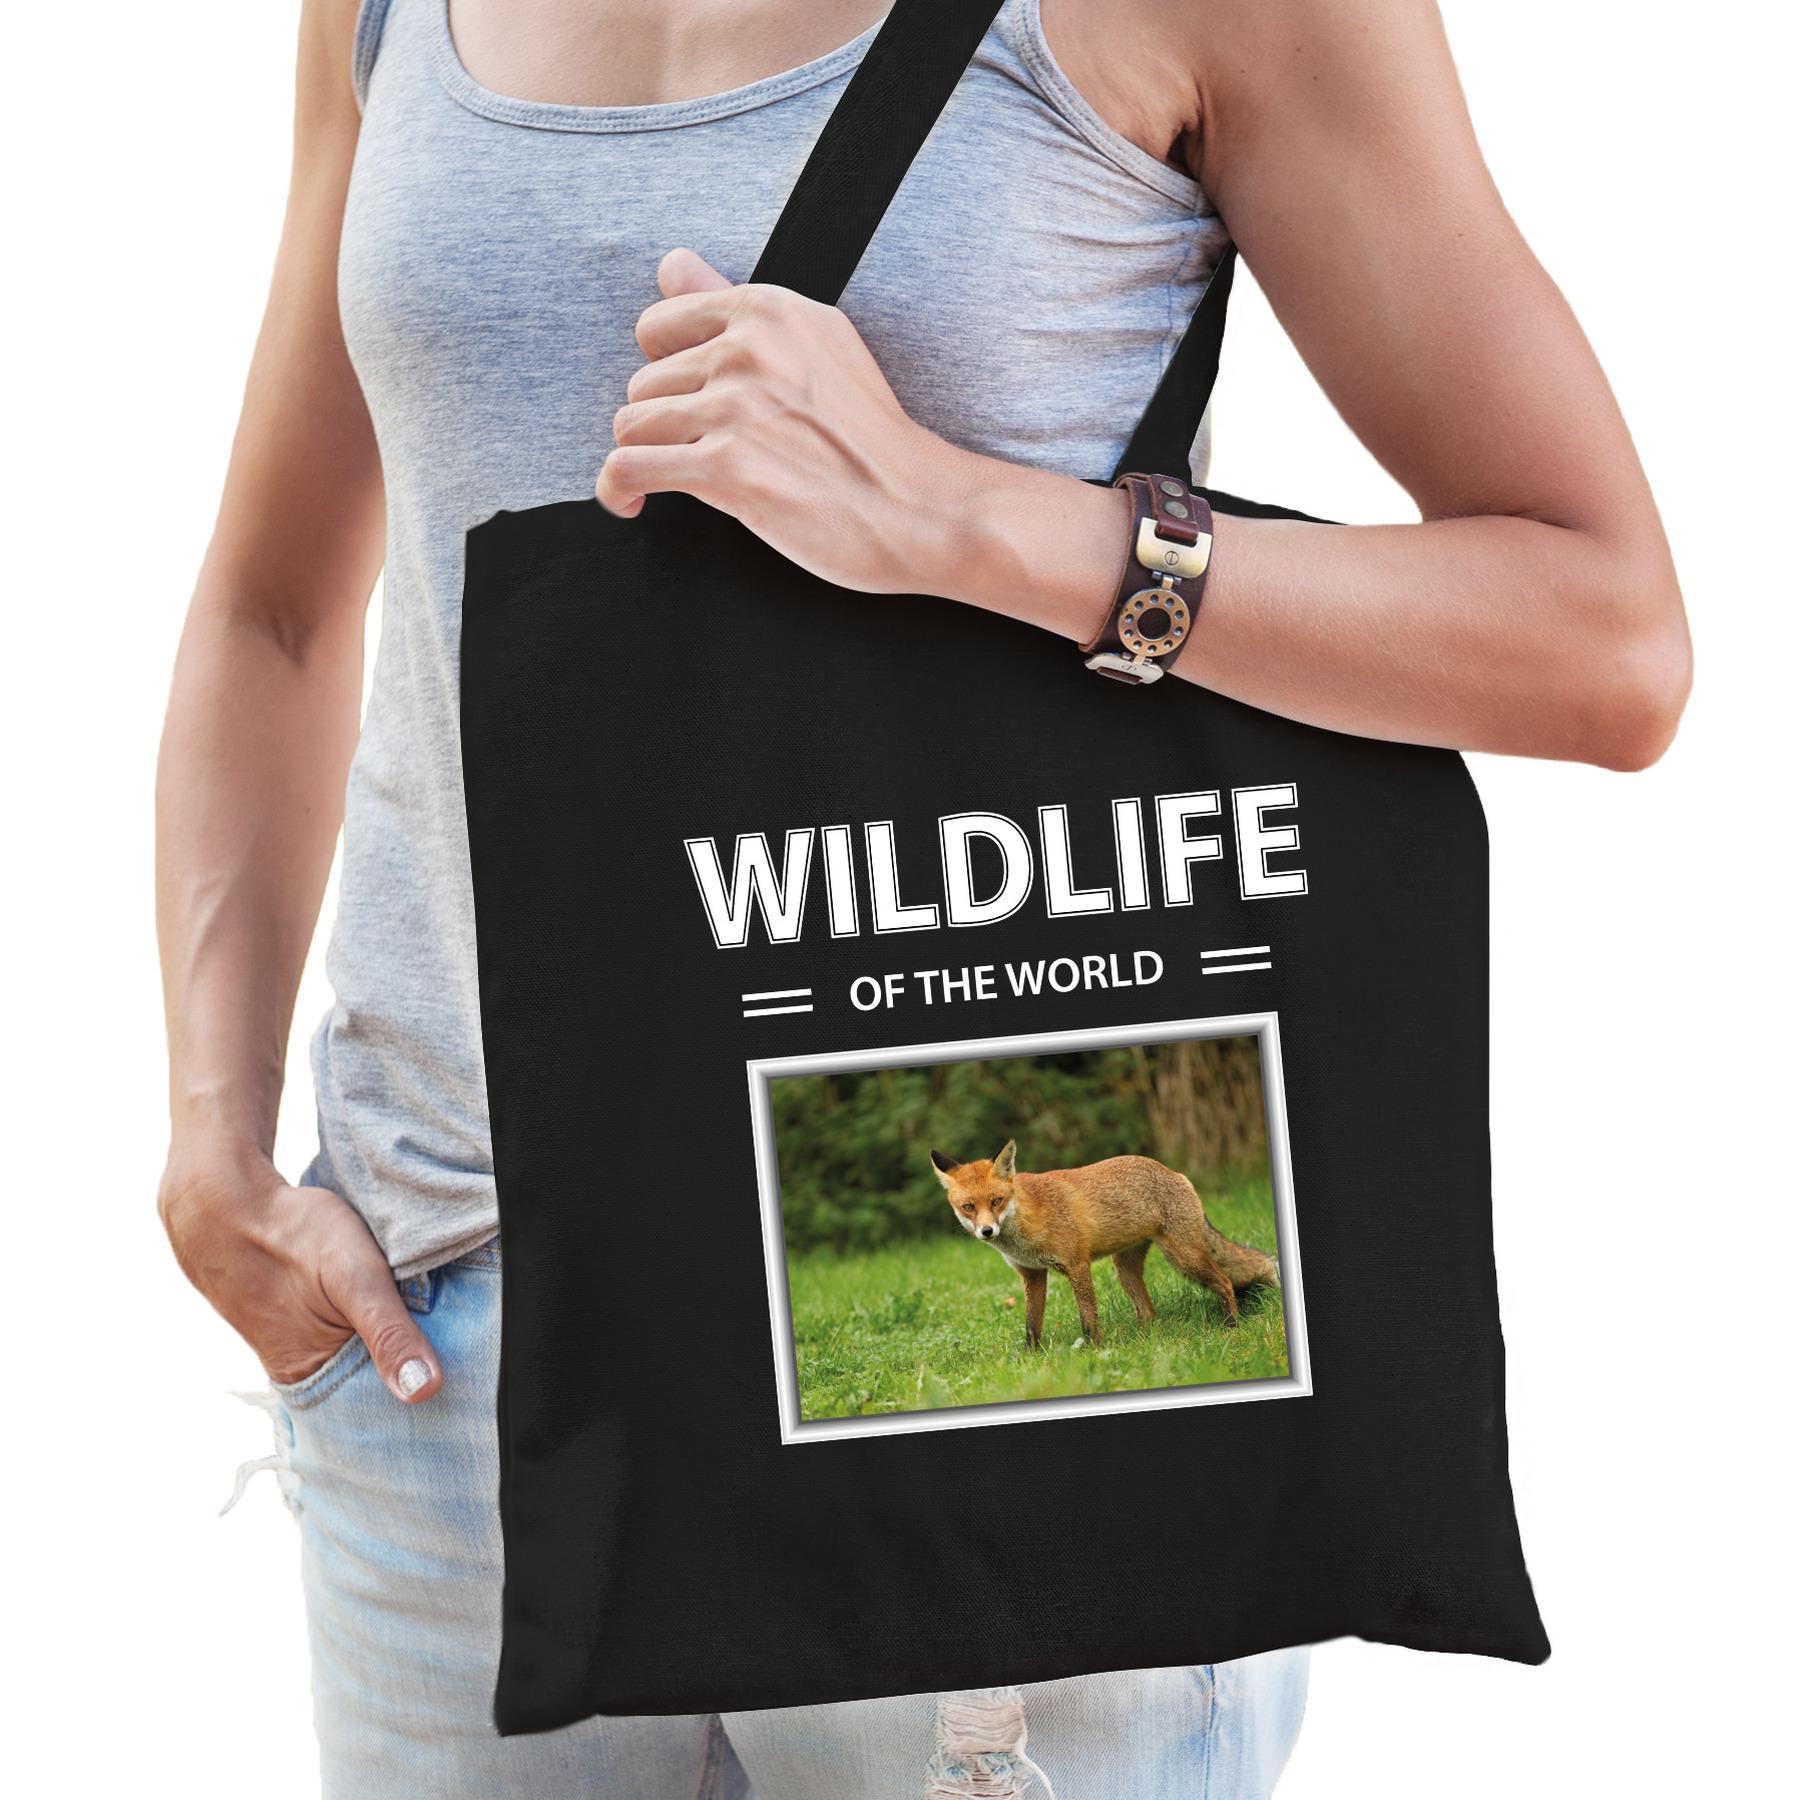 Katoenen tasje Vossen zwart - wildlife of the world Vos cadeau tas